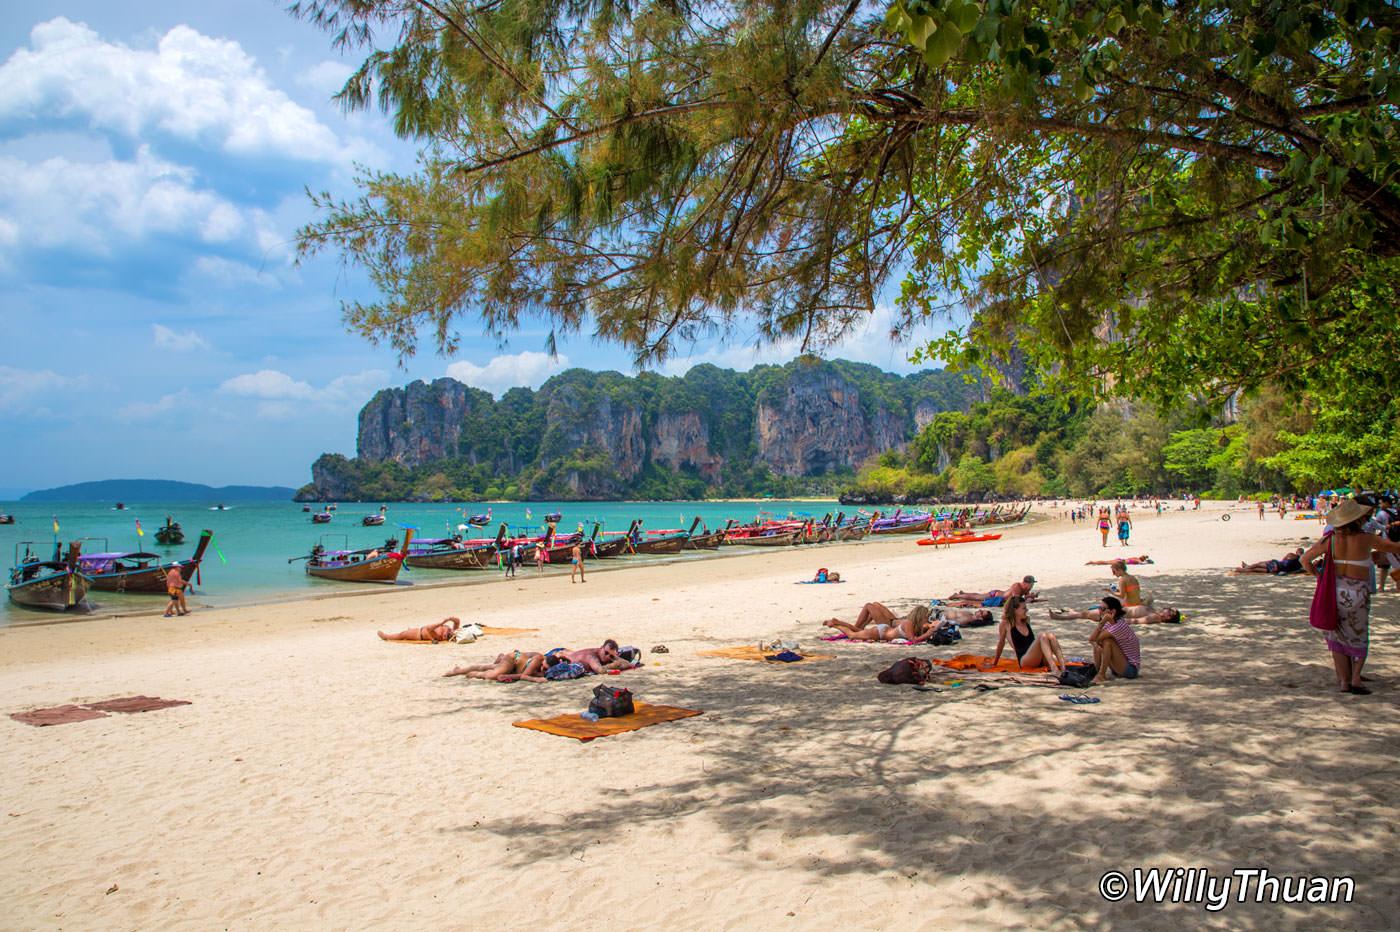 Railay Beach in Krabi, Thailand - PHUKET 101